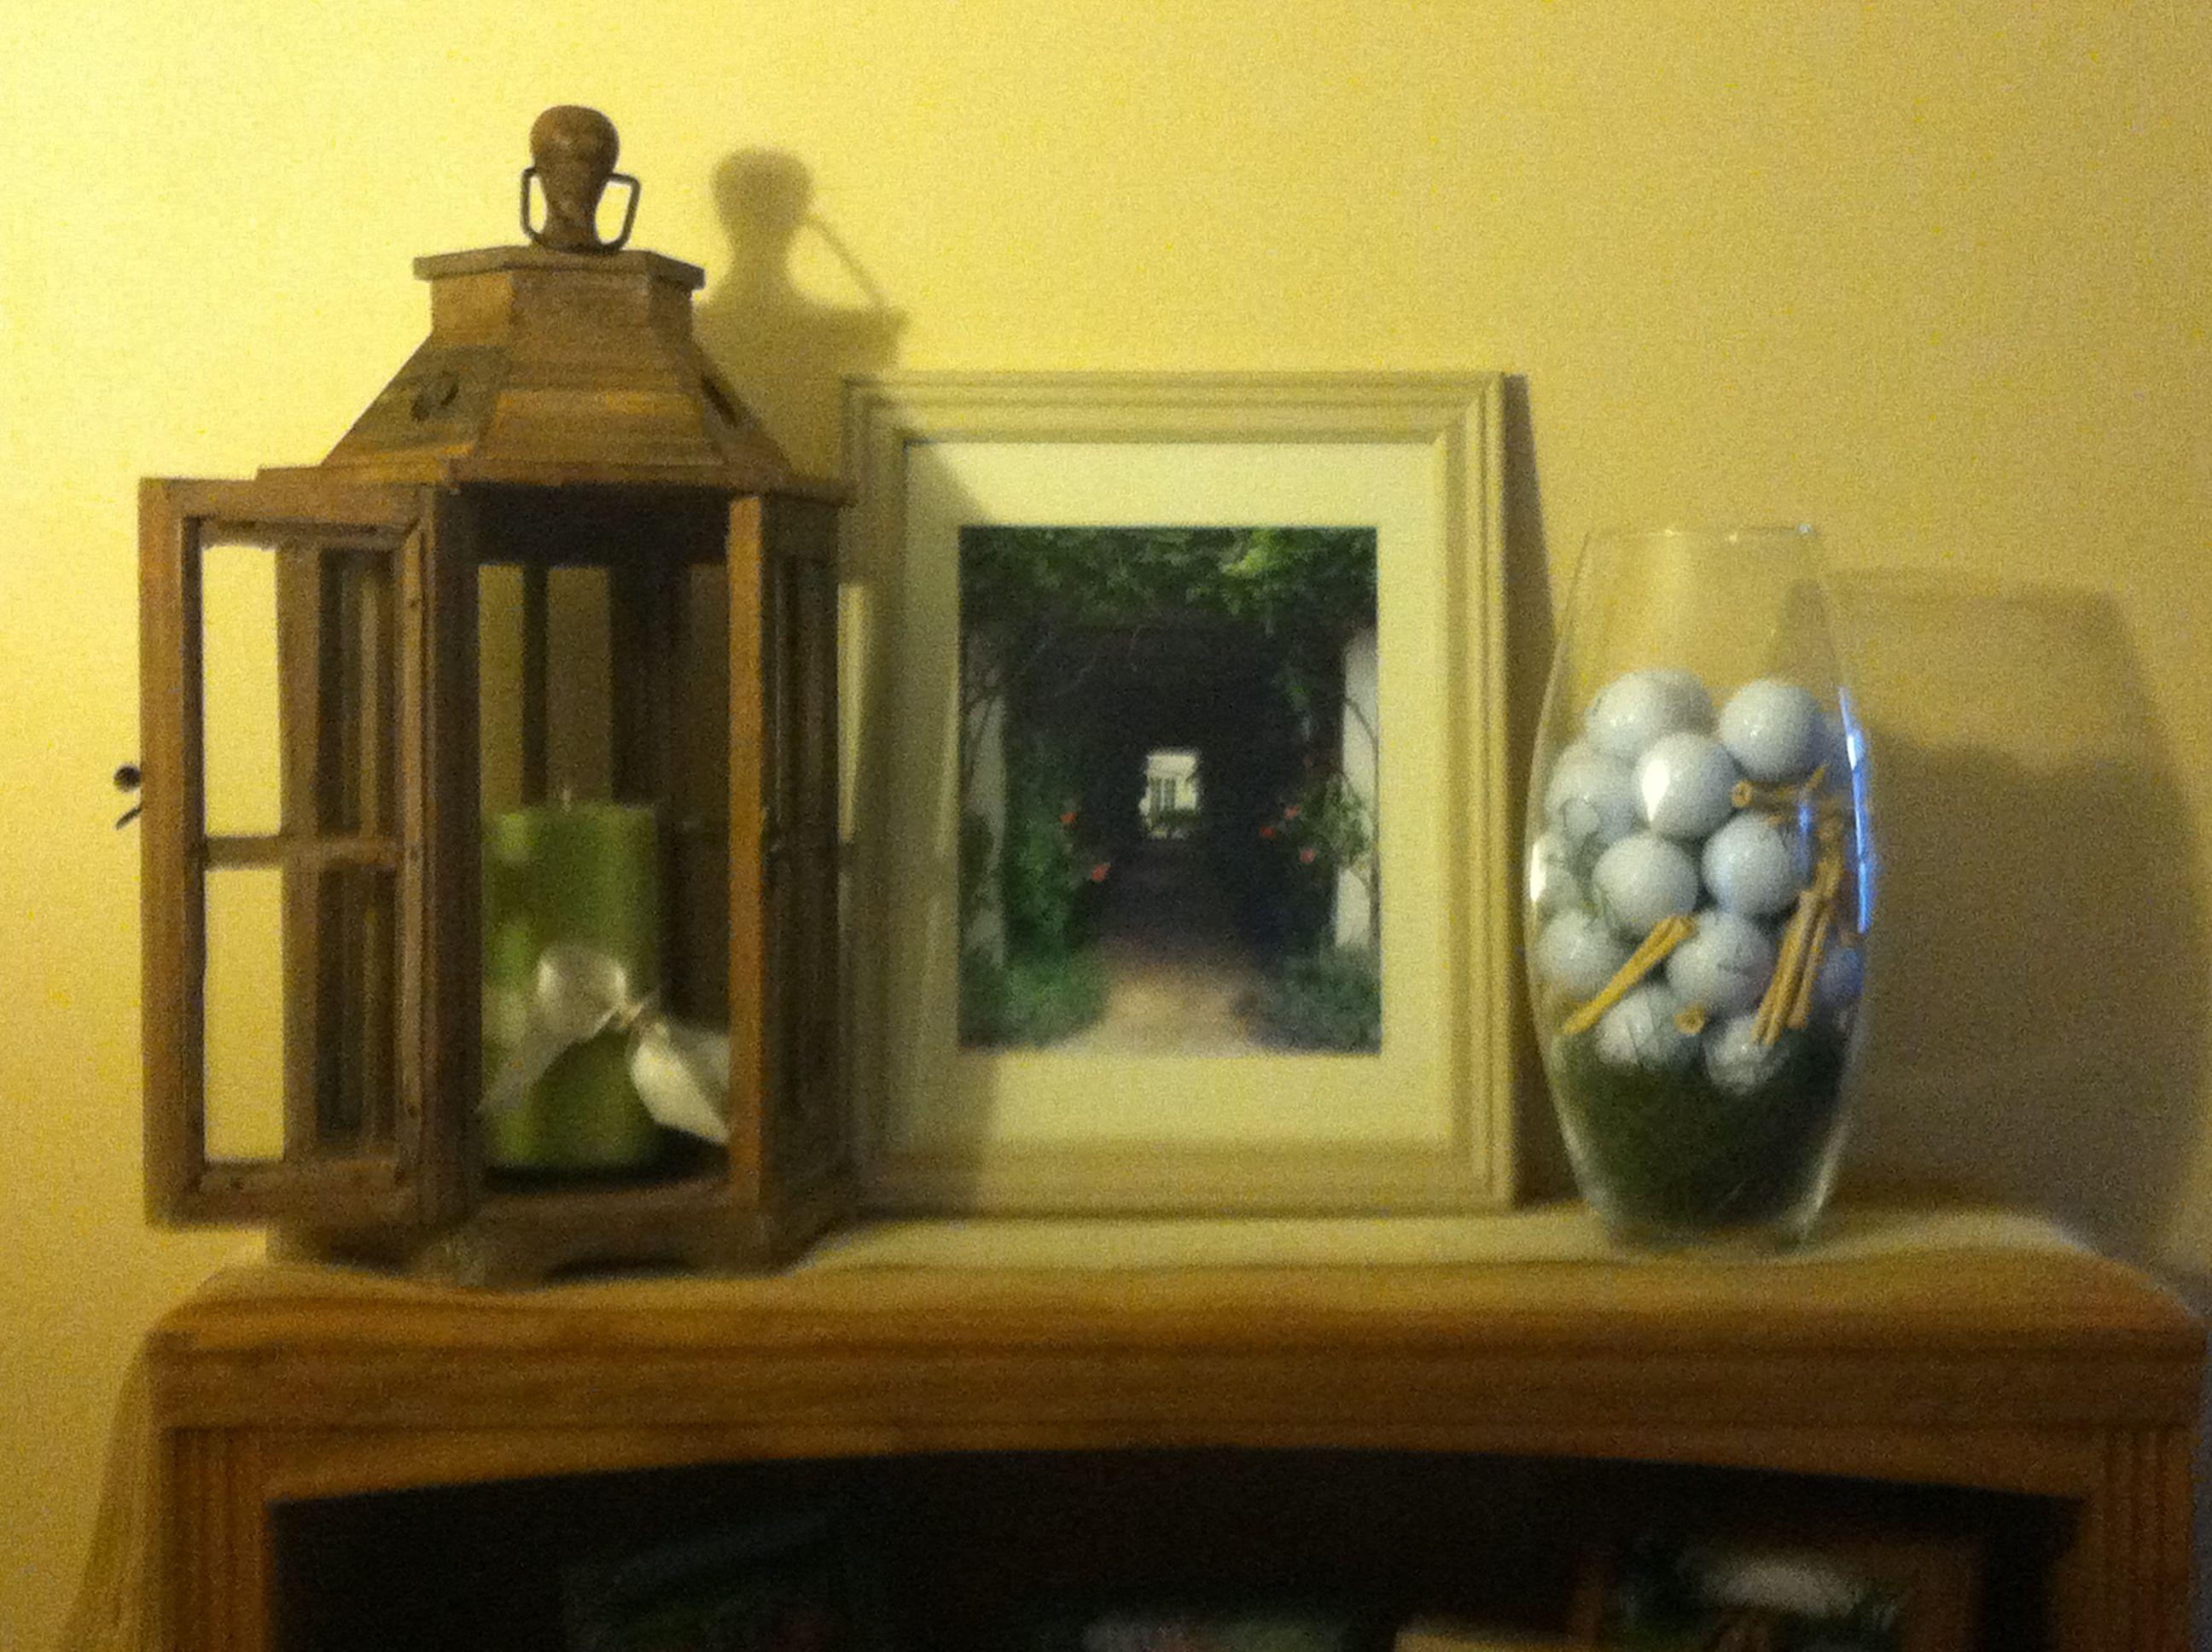 Fall, Lantern, Candle, Golf, Decor, Decoration, Bookshelf